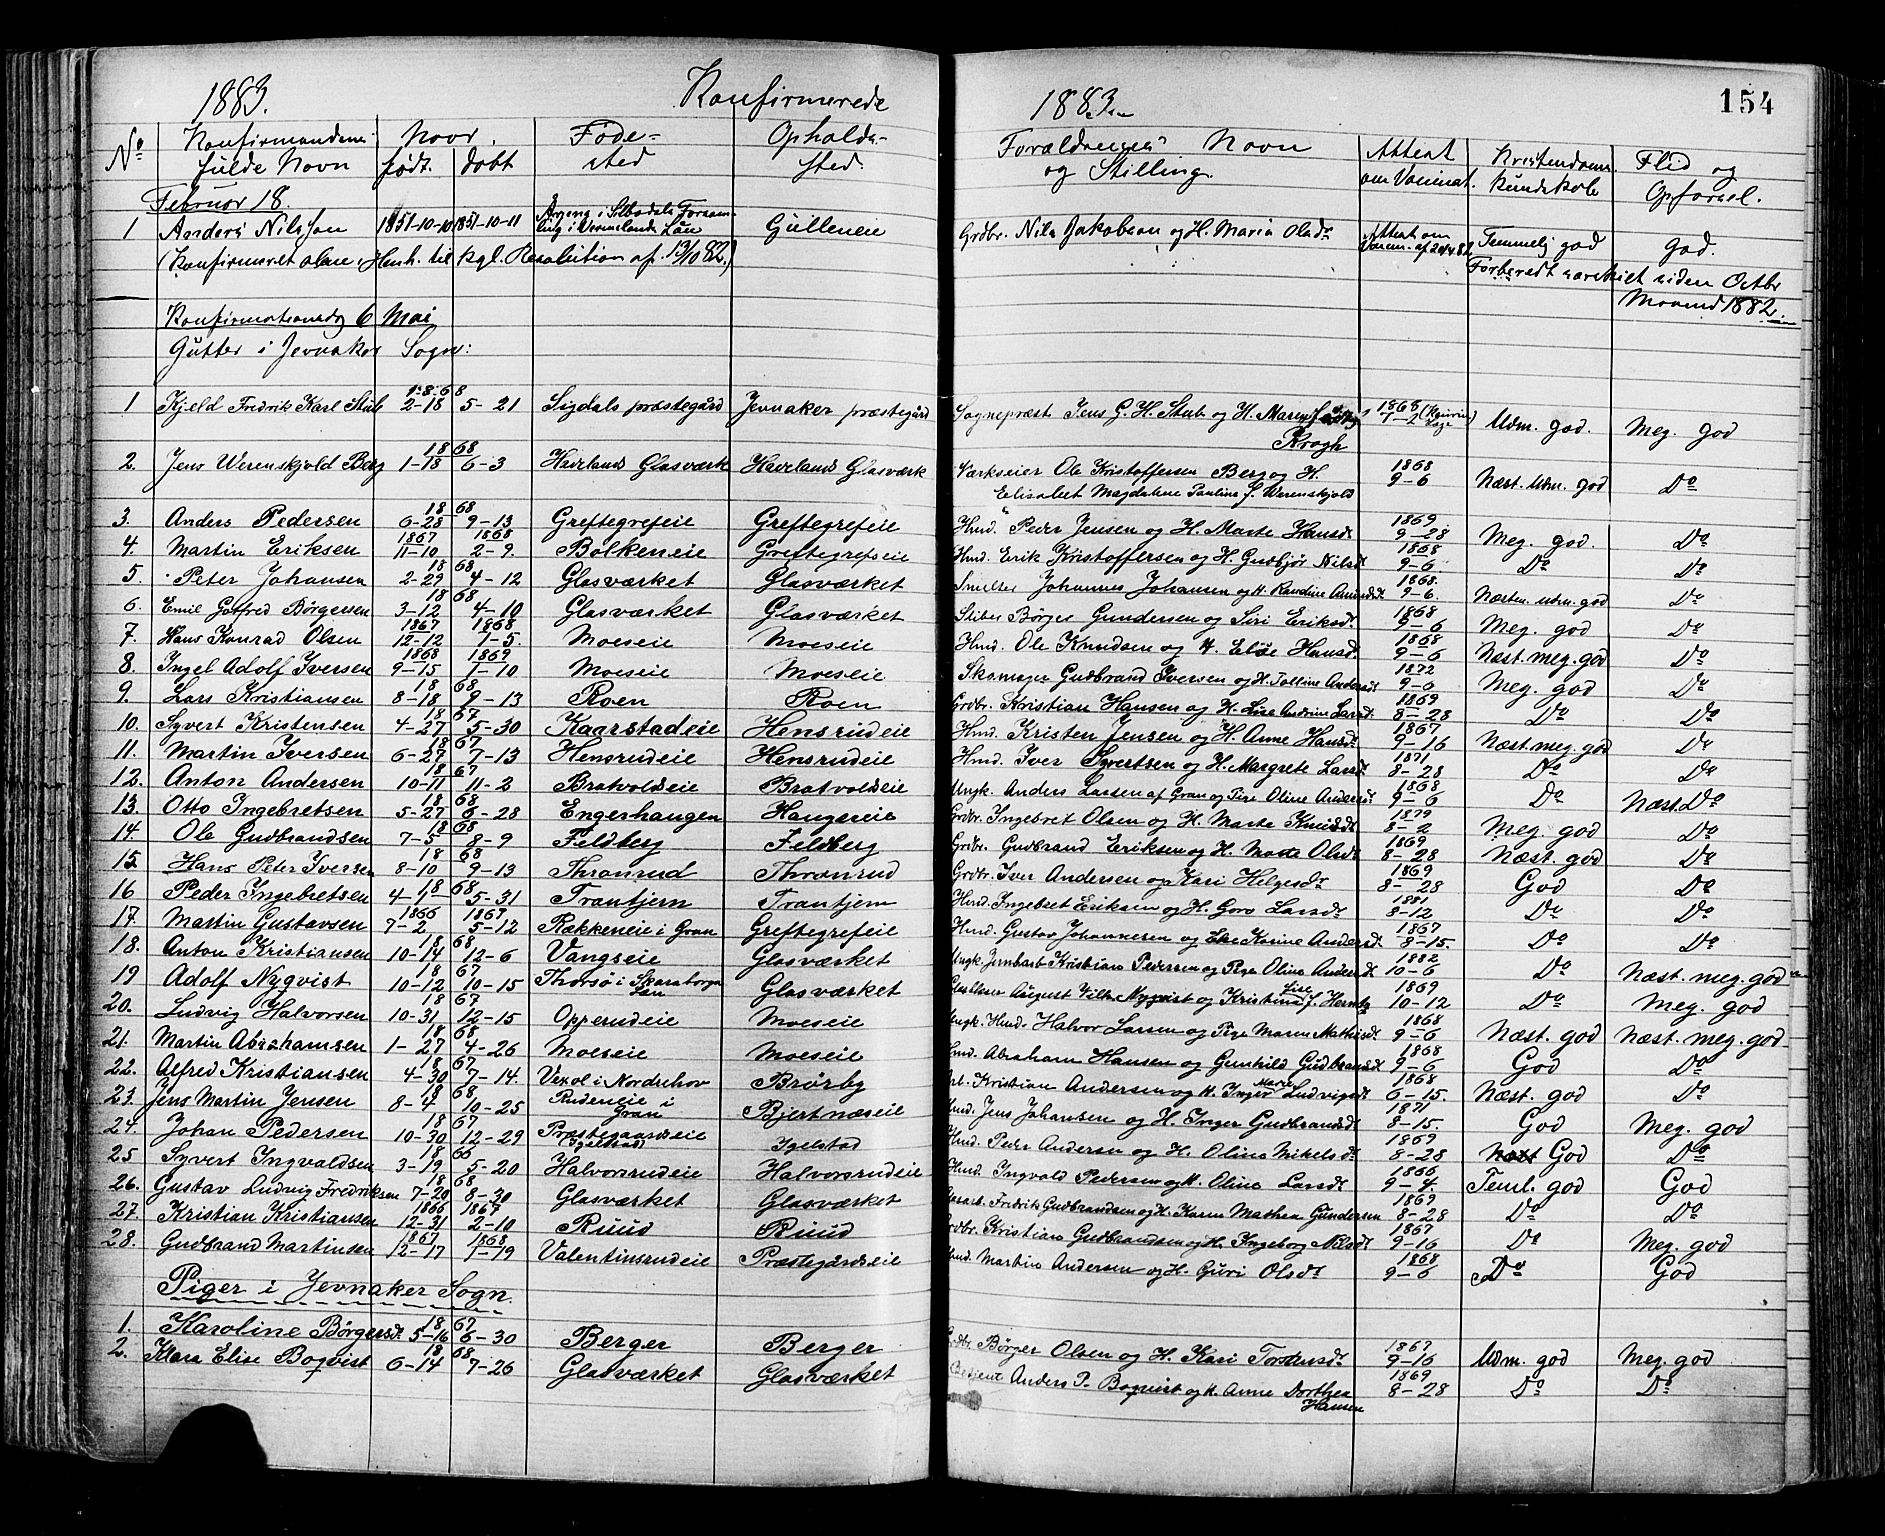 SAH, Jevnaker prestekontor, Ministerialbok nr. 8, 1877-1890, s. 154